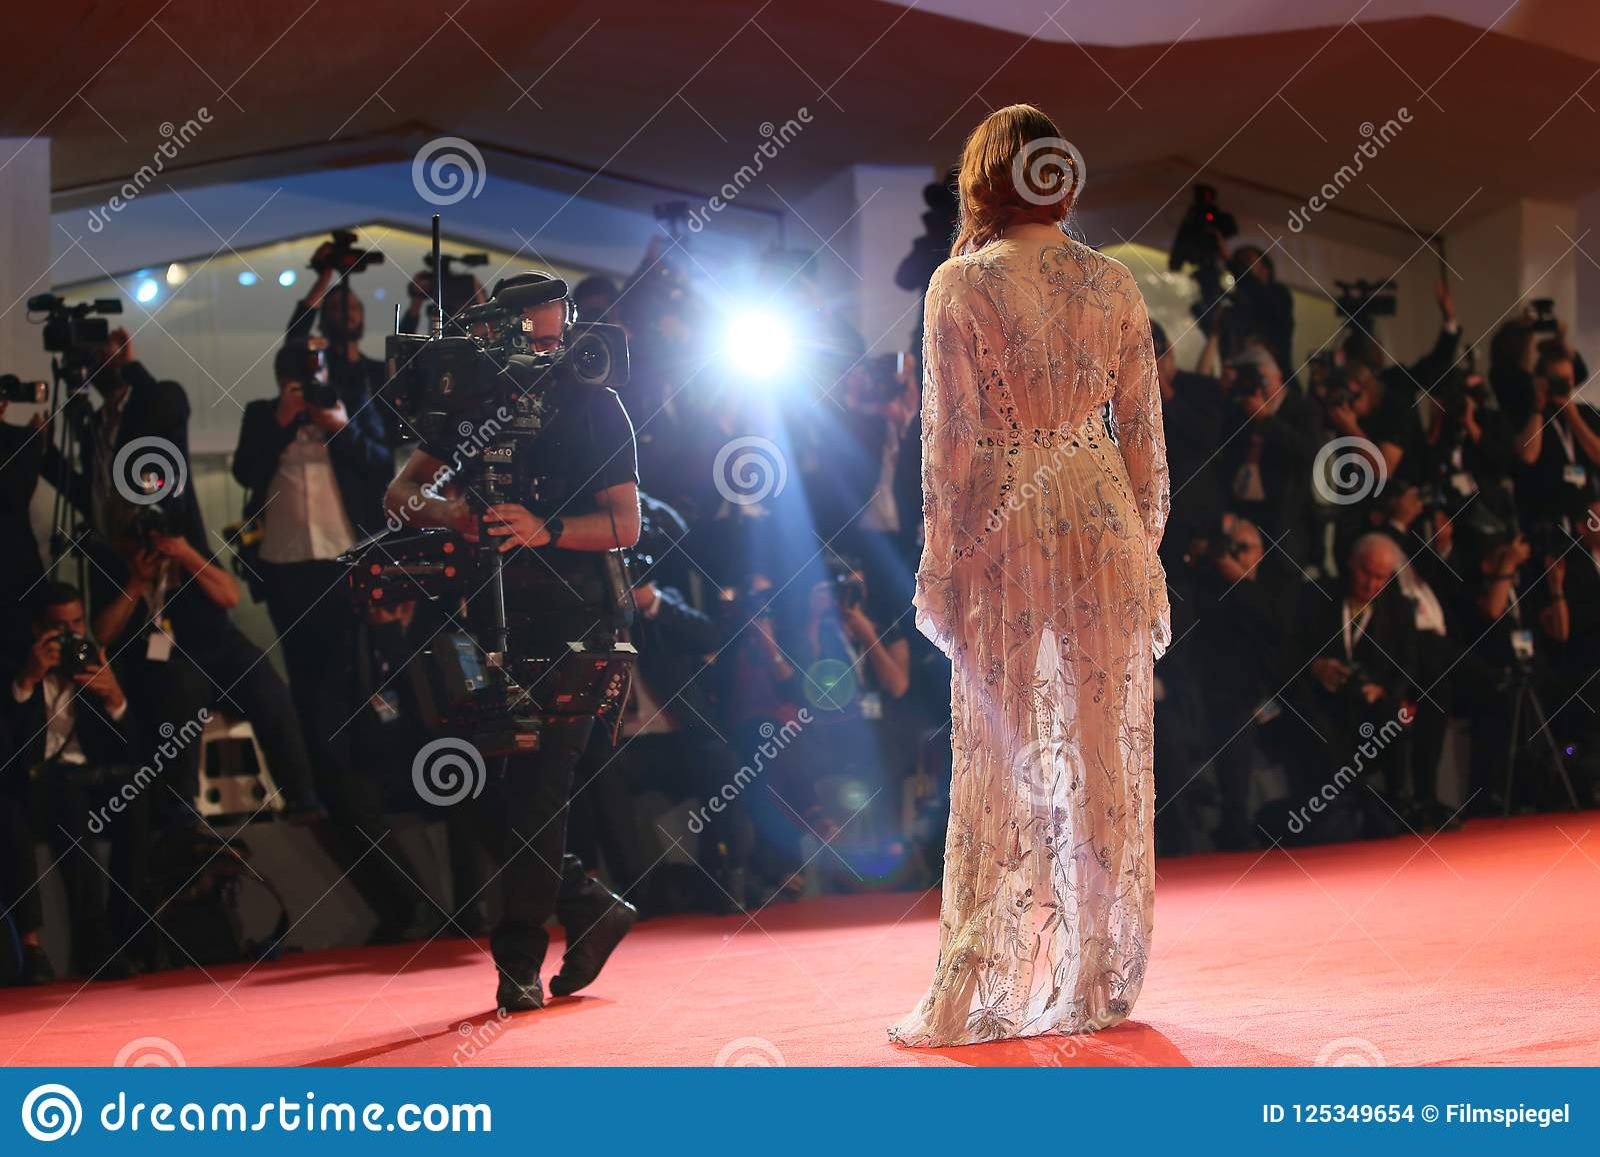 https fr dreamstime com promenades d emma stone actrice tapis rouge image125349654